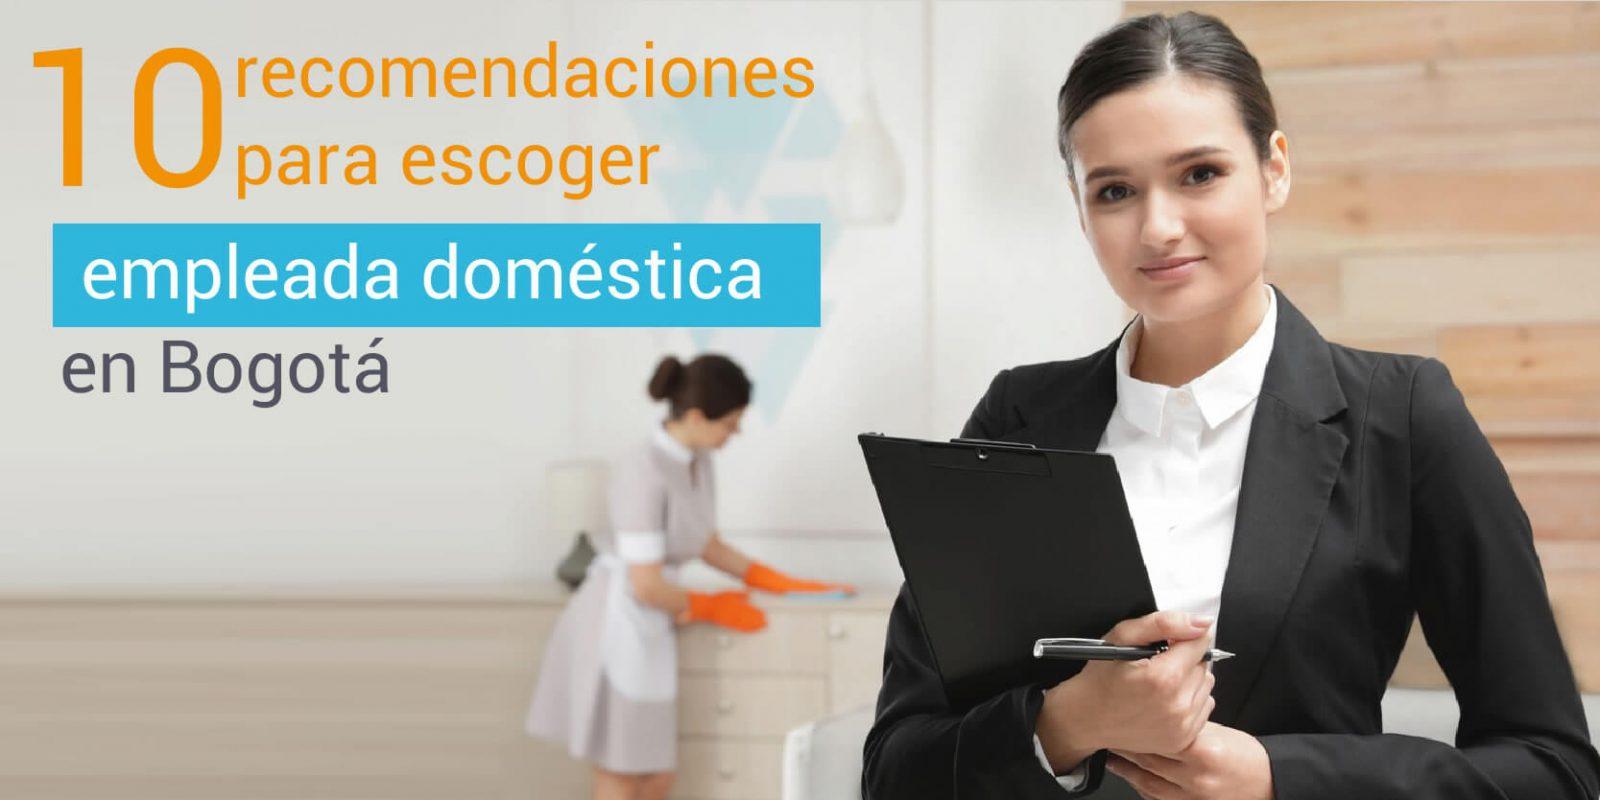 10 recomendaciones para escoger empleada doméstica en bogotá